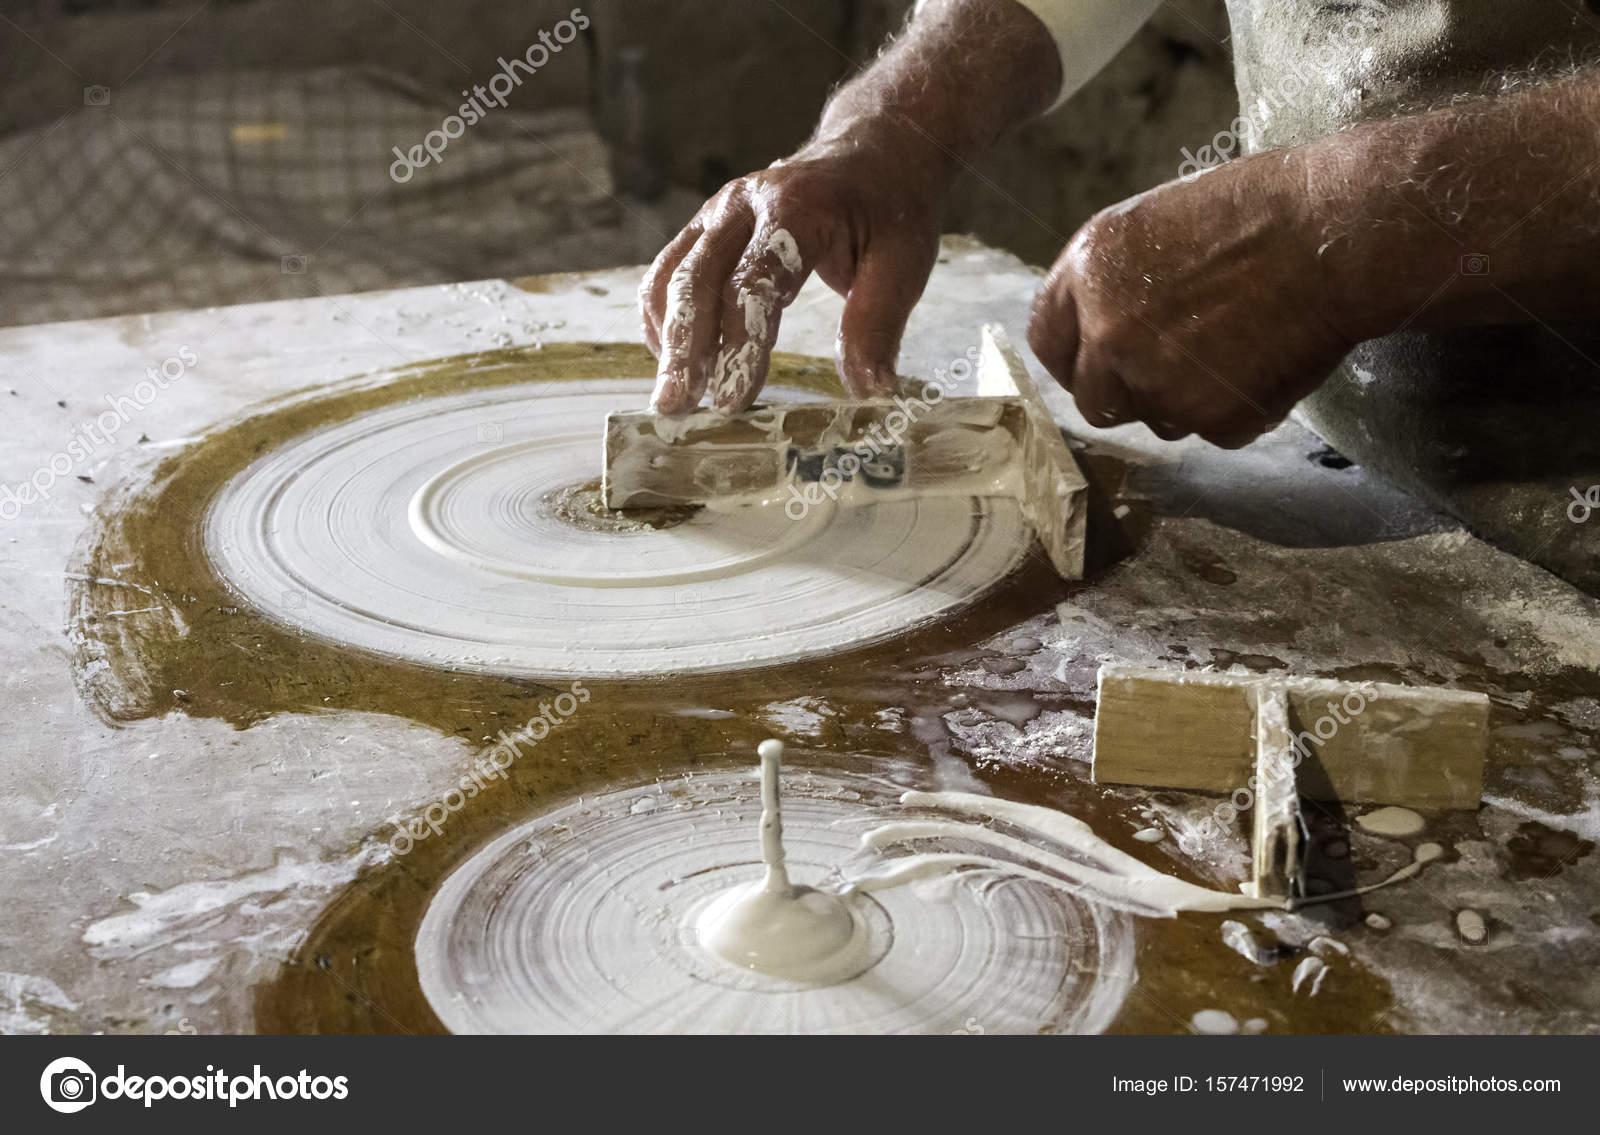 Artesanato Japones ~ Moldes de gesso artesanato u2014 Stock Photo u00a9 celiafoto #157471992